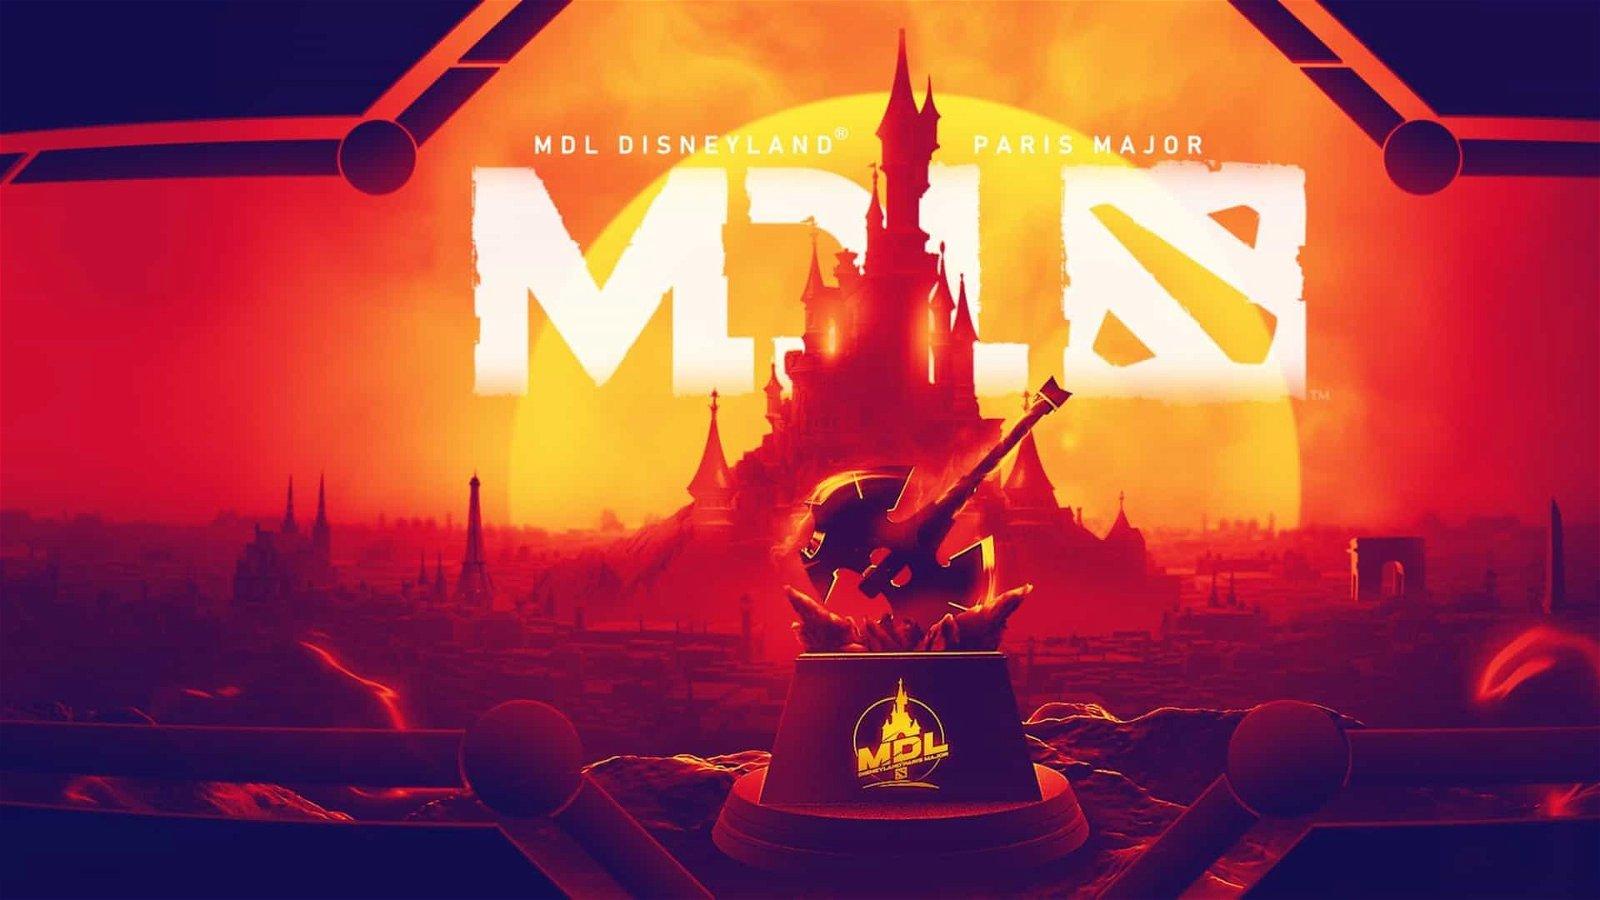 Dota 2 MDL Disneyland Paris Tournament Preview